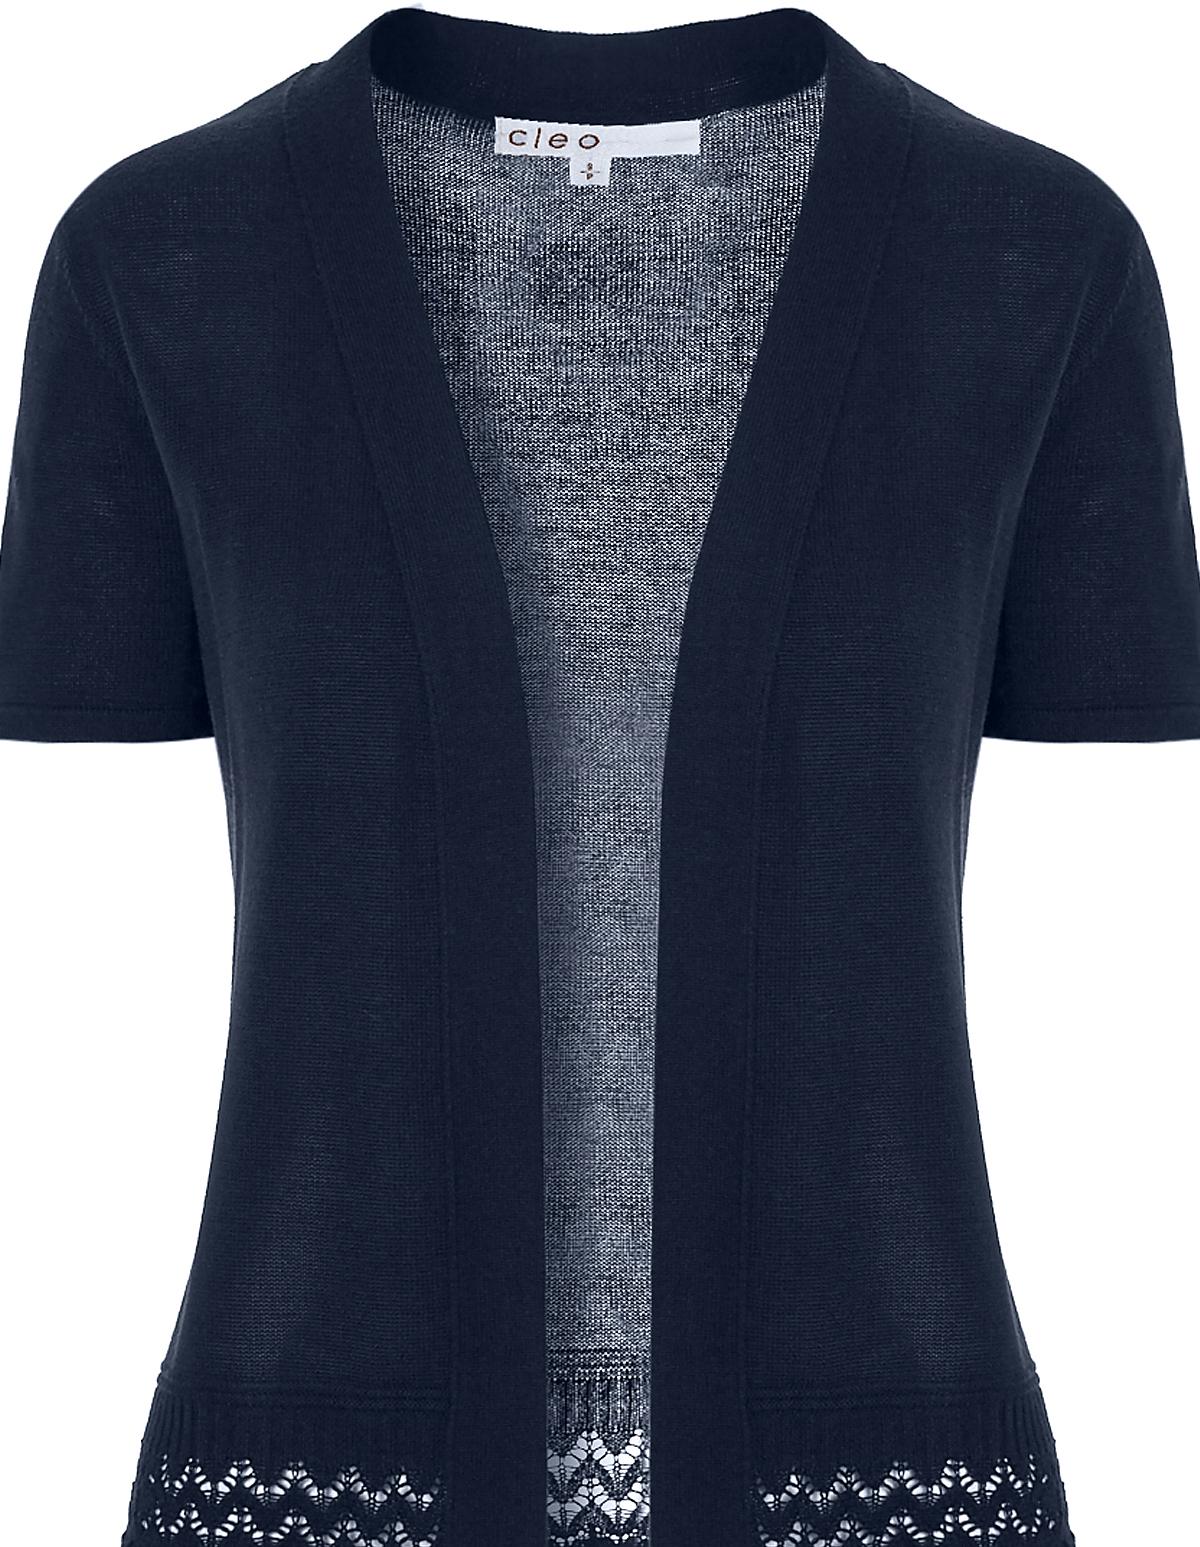 Navy Short Sleeve Cardigan   Cleo